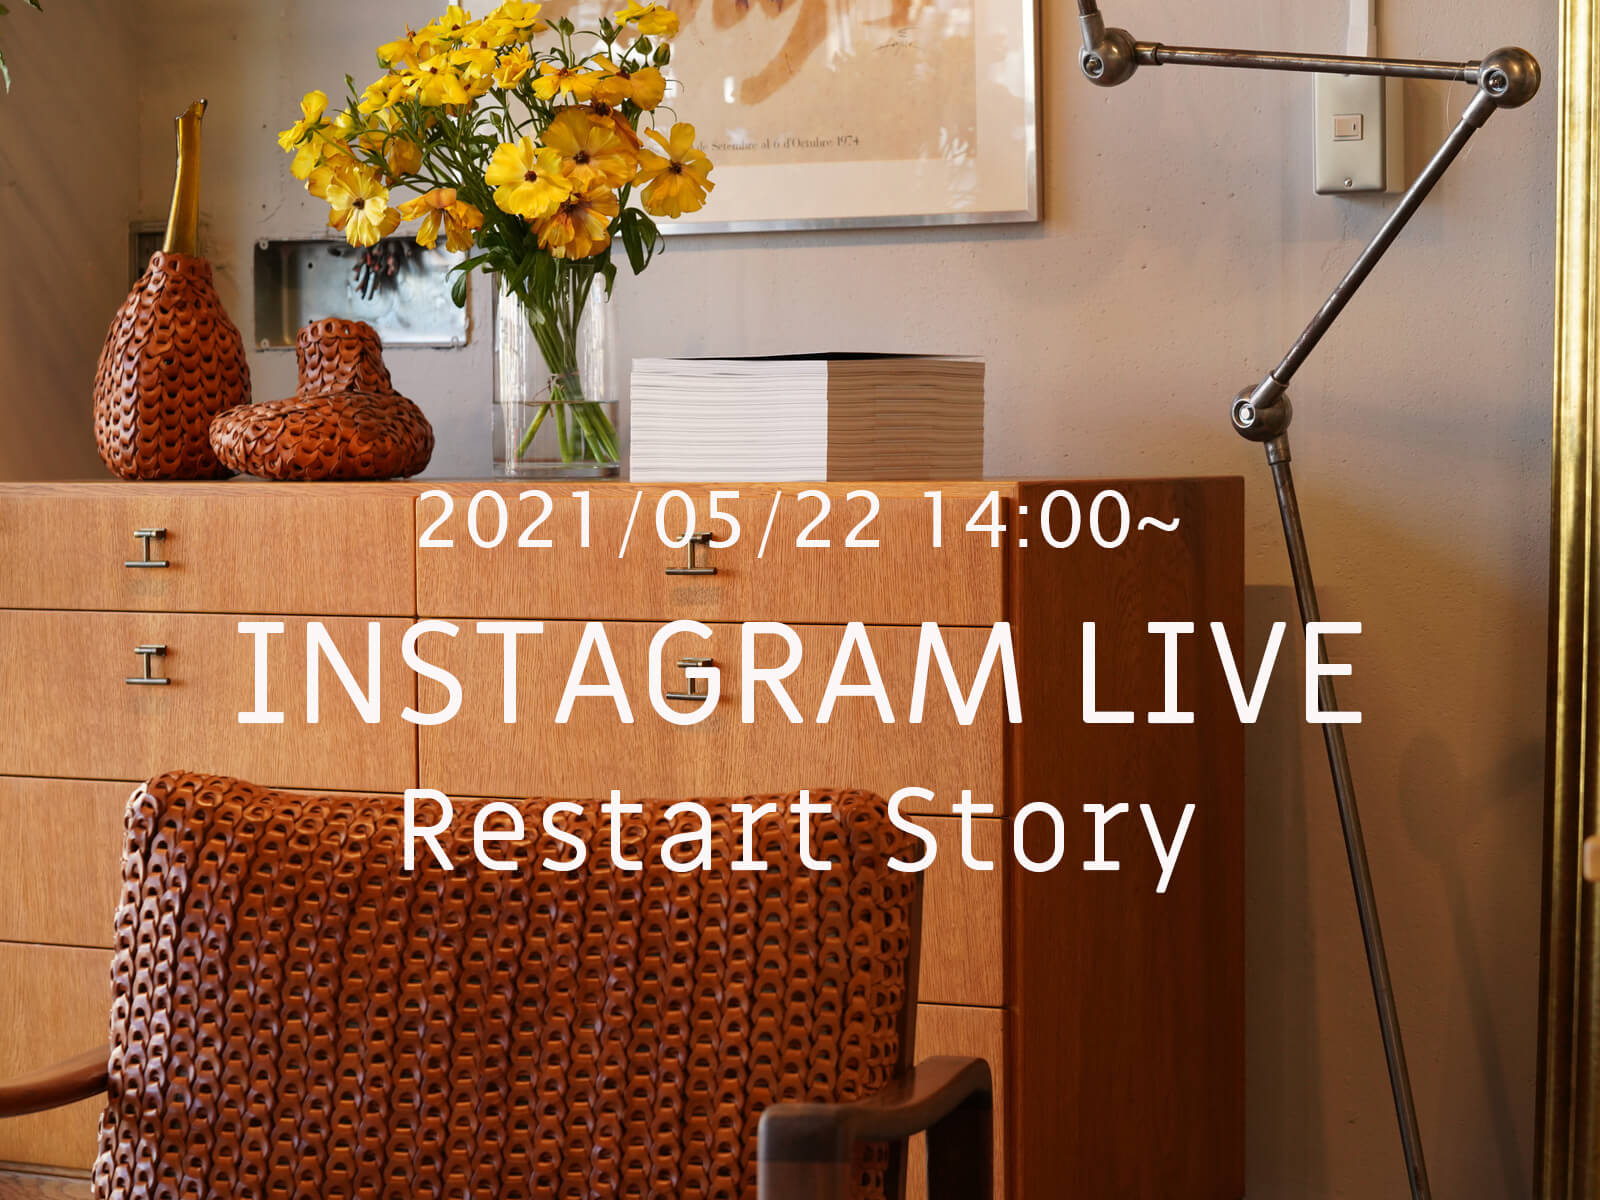 INSTAGRAM LIVE 2021/5/22 14:00~ / Restart Story / 営業再開に向けて